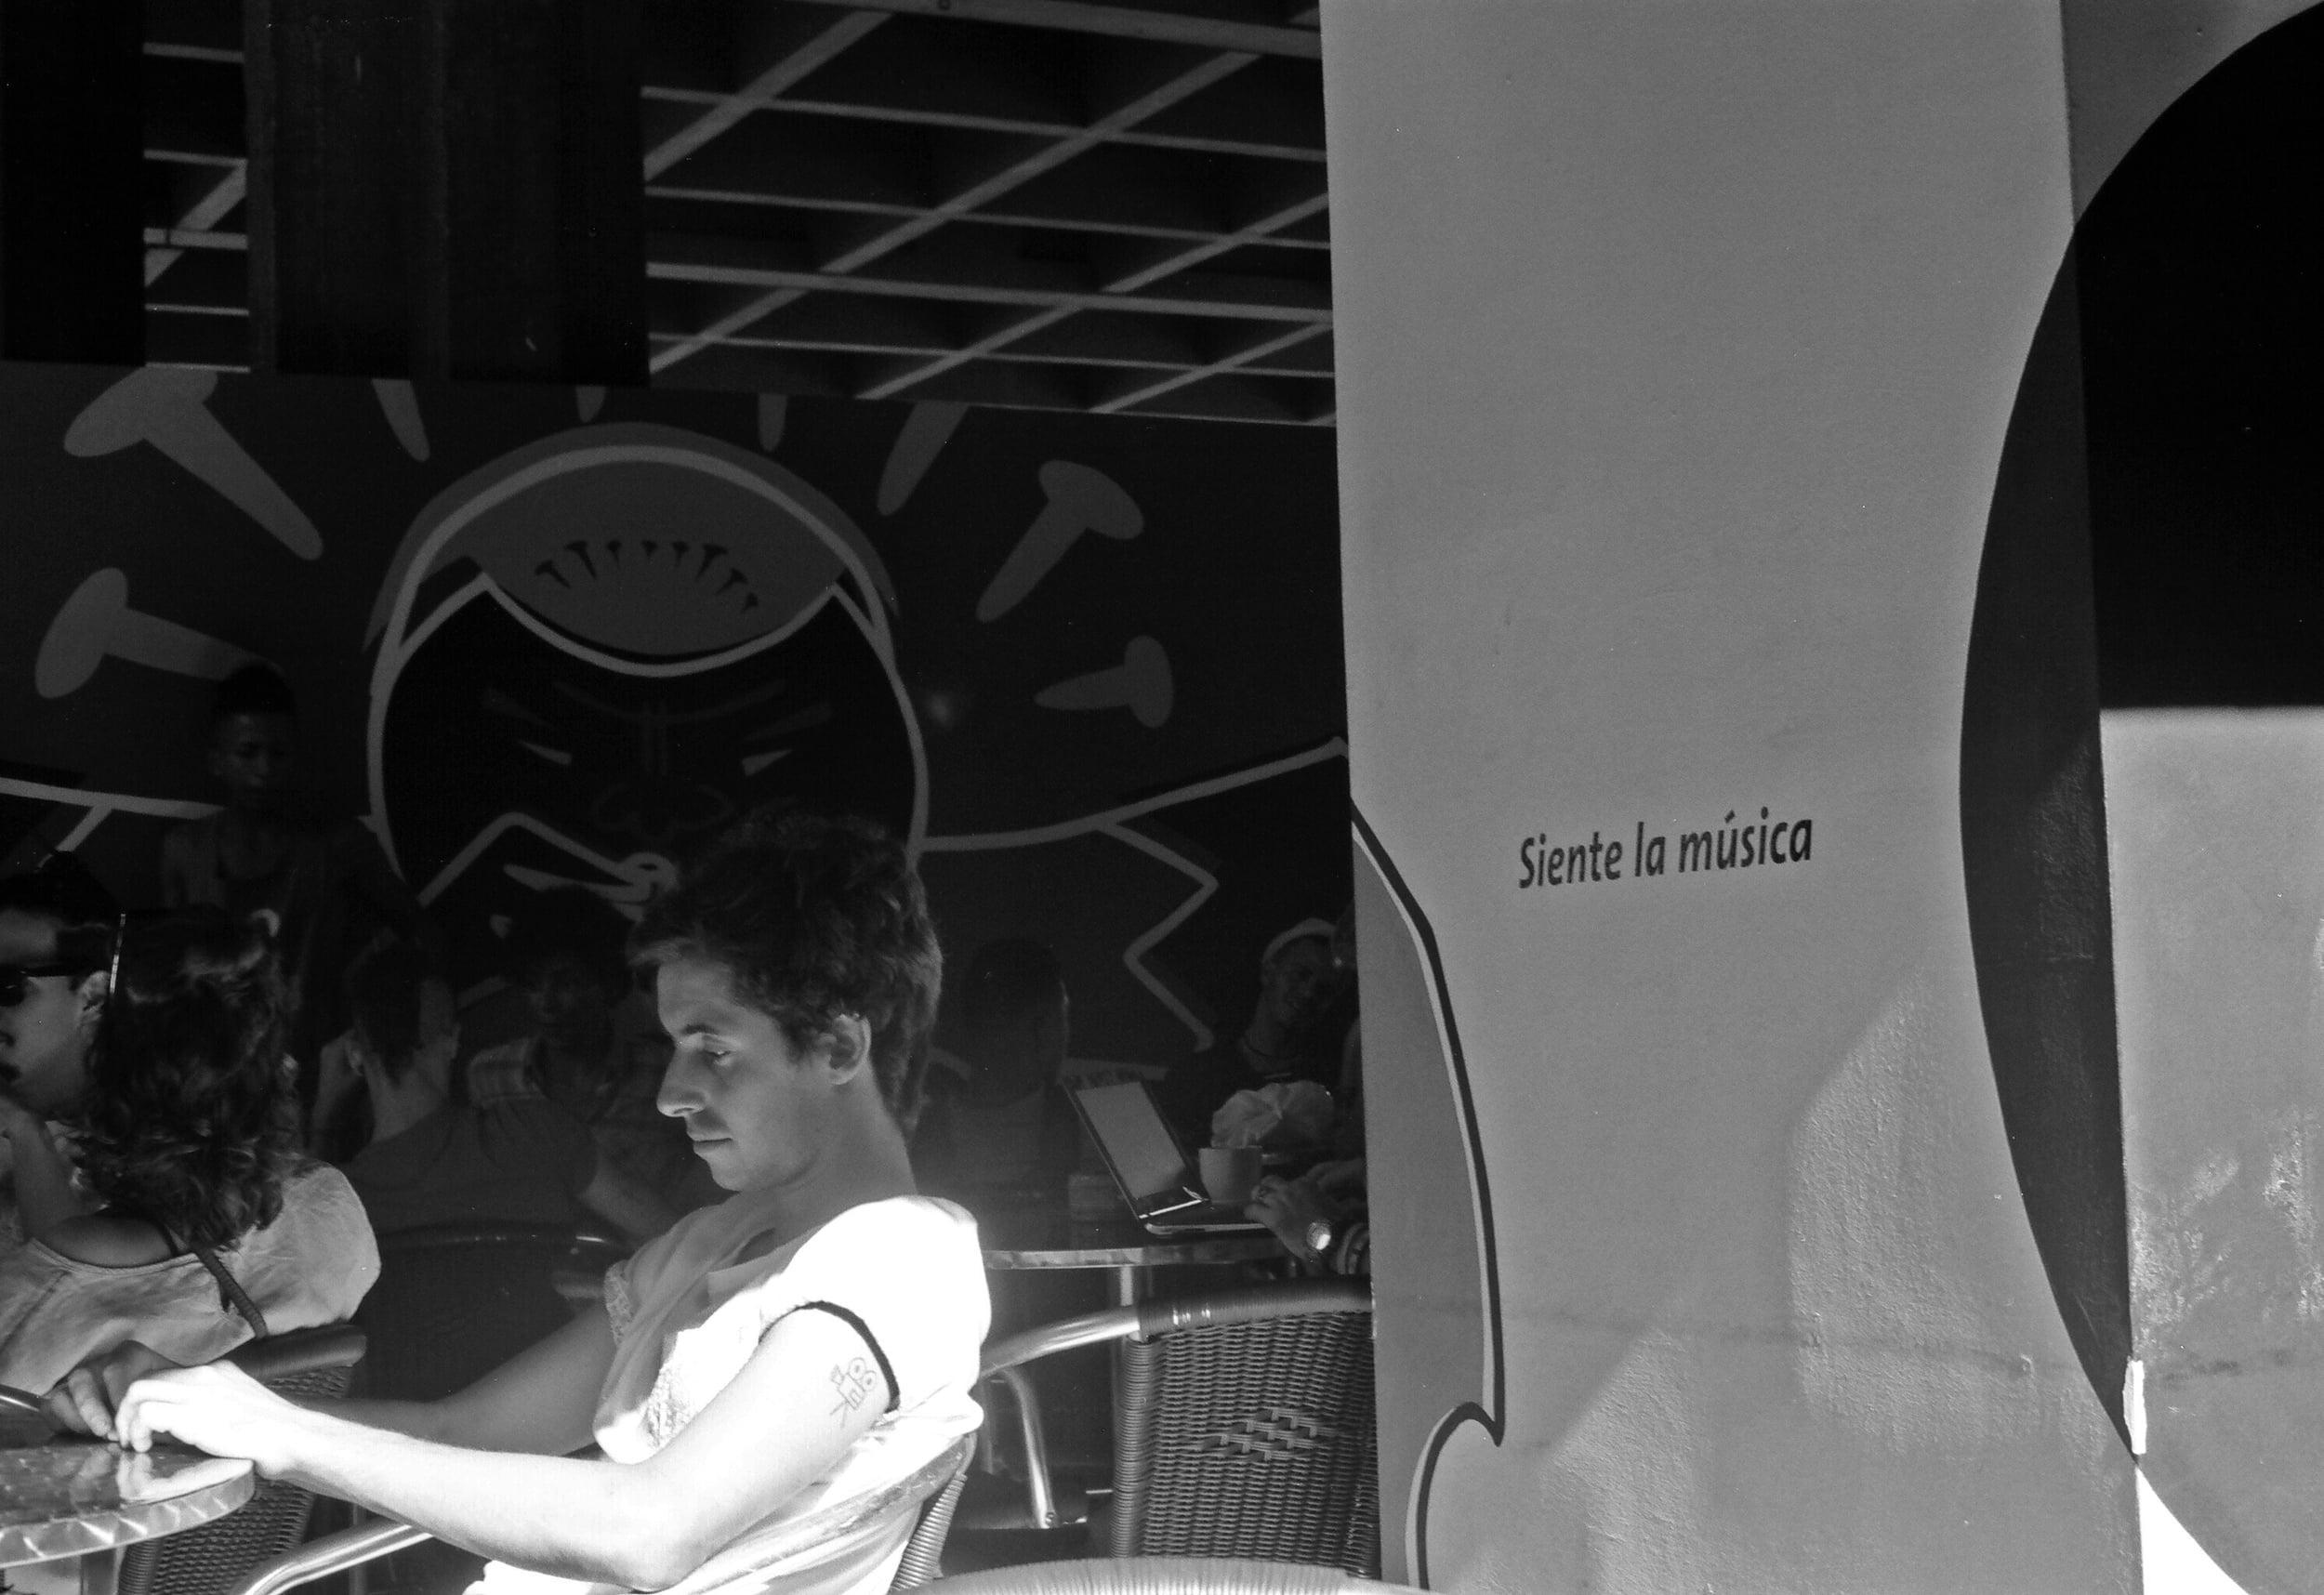 Cafe in Vedado